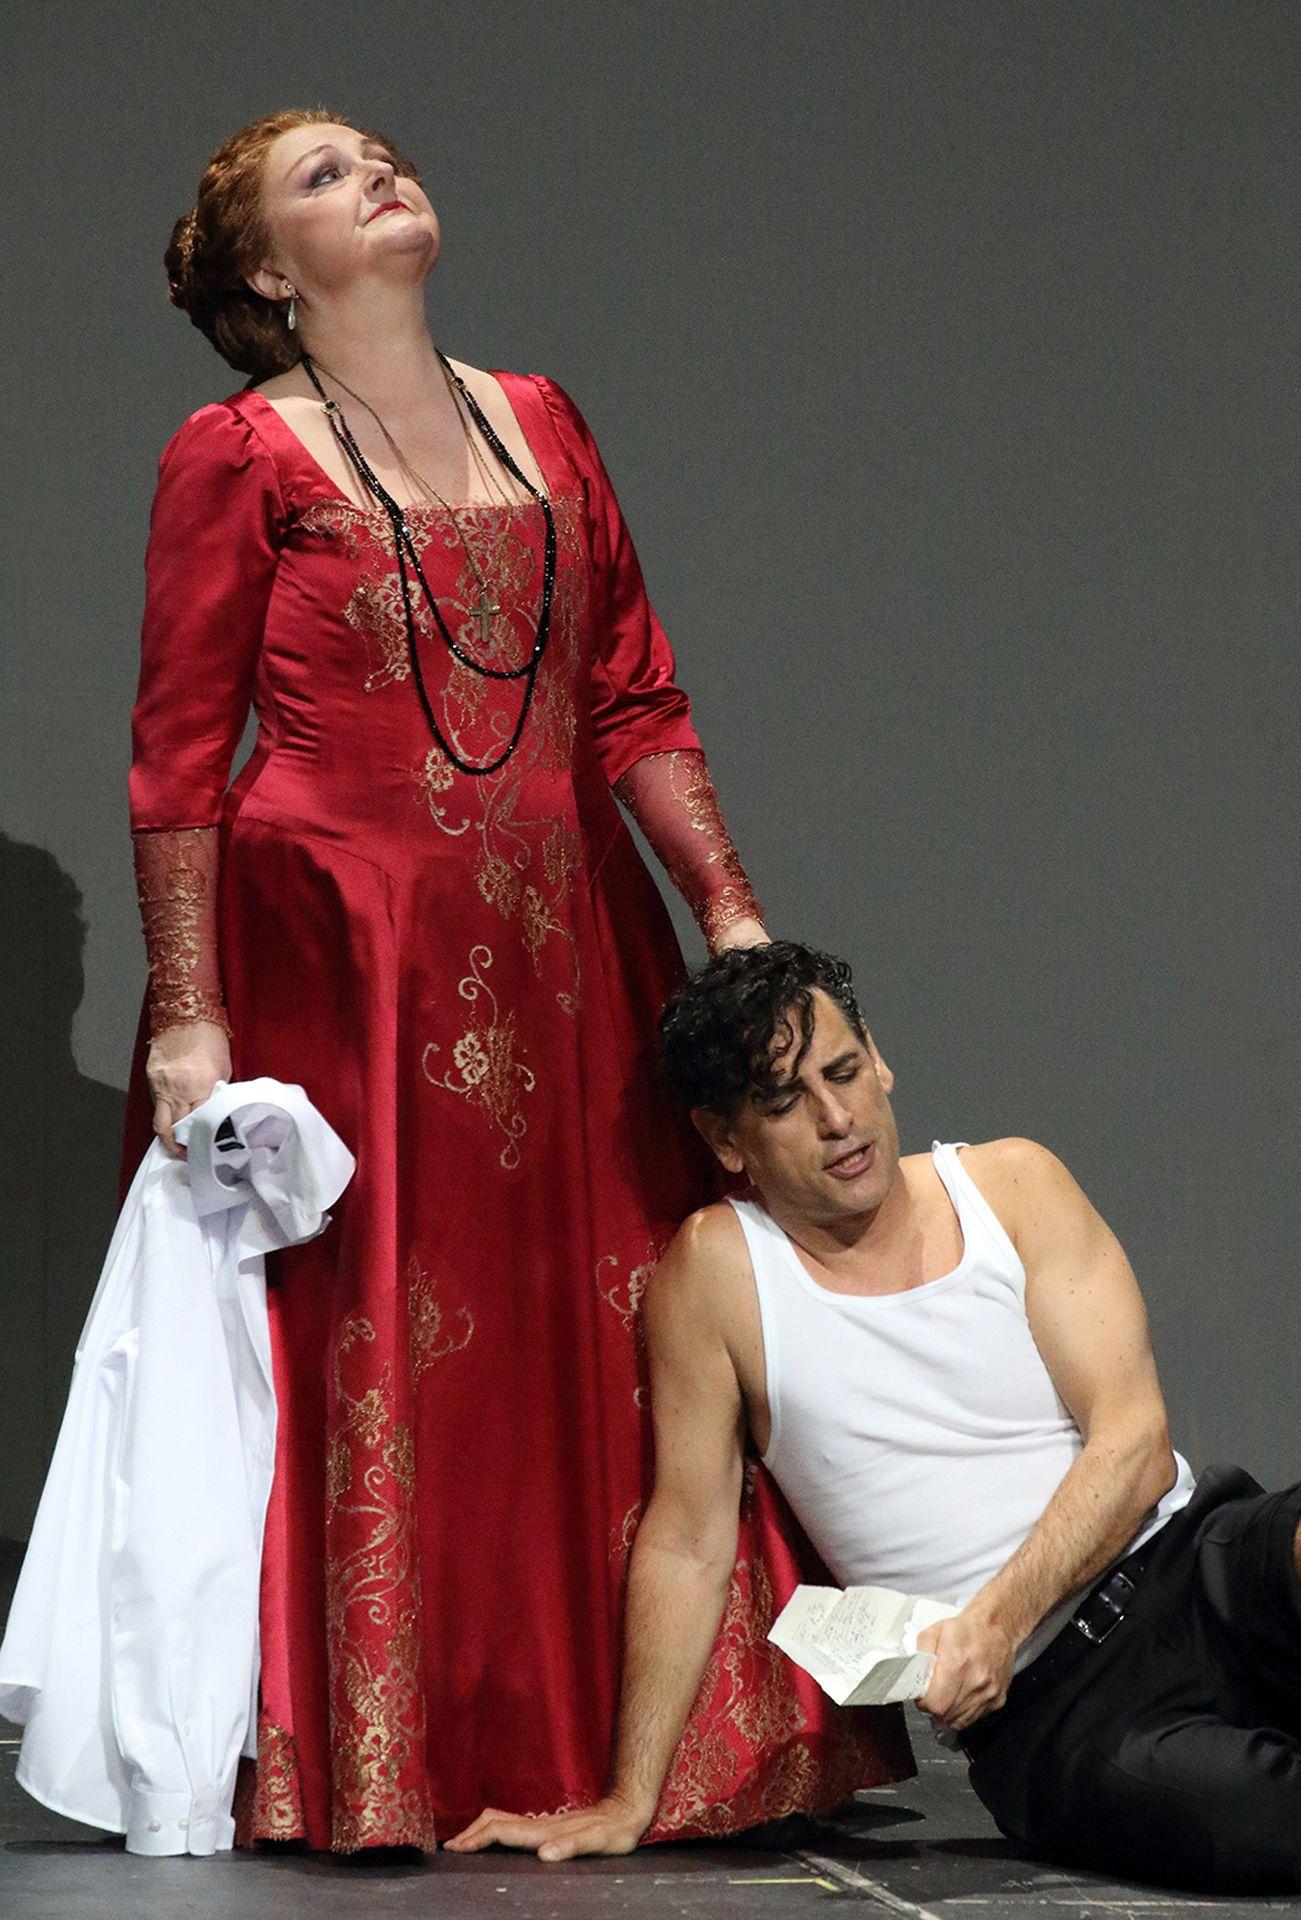 Gaetano Donizetti, Lucrezia Borgia, Edita Gruberová, Juan Diego Flórez,  Bayerische Staatsoper, München